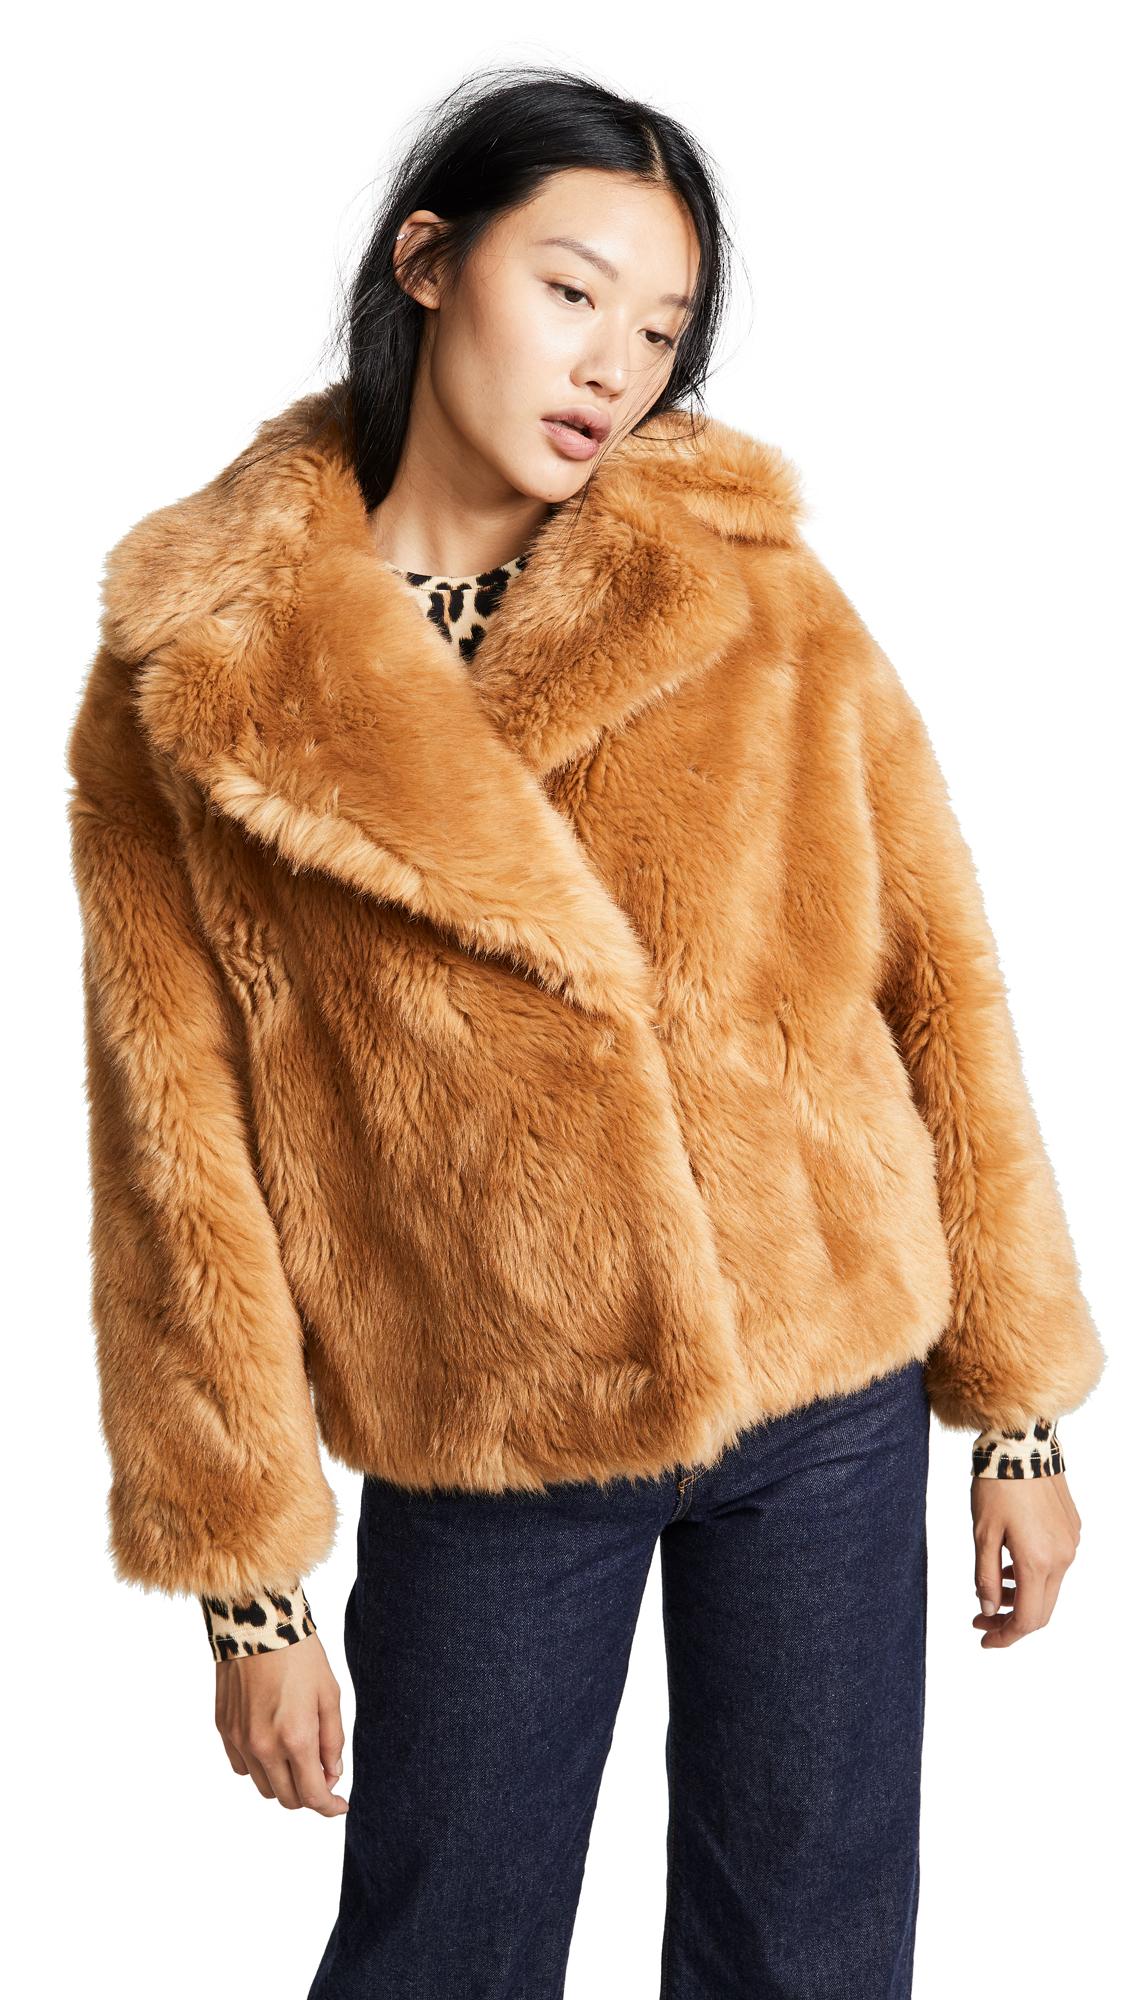 Faux Fur Short Jacket in Brown